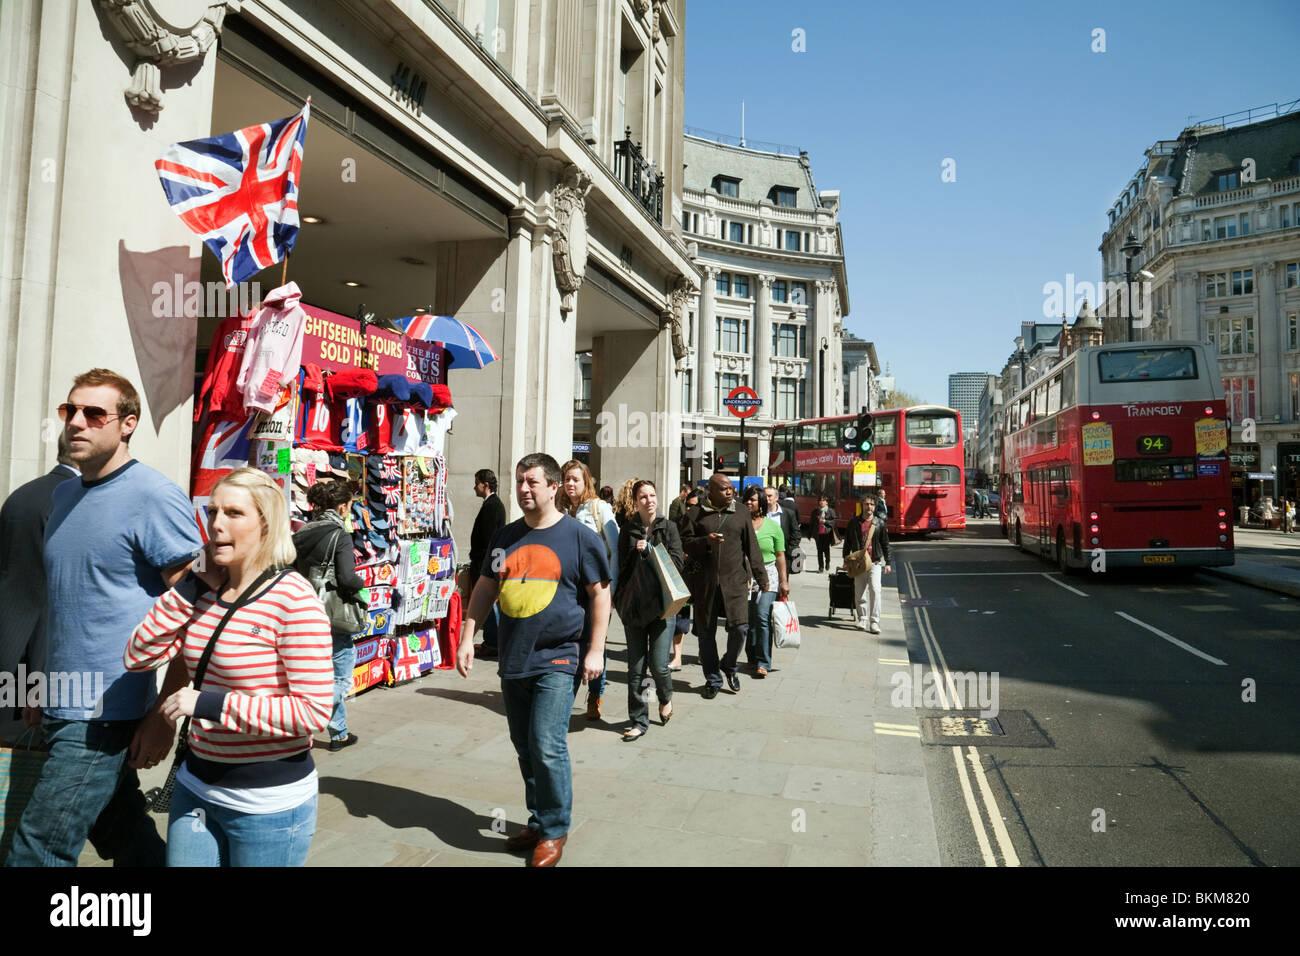 Scene on Oxford street near Oxford circus, central London, UK - Stock Image